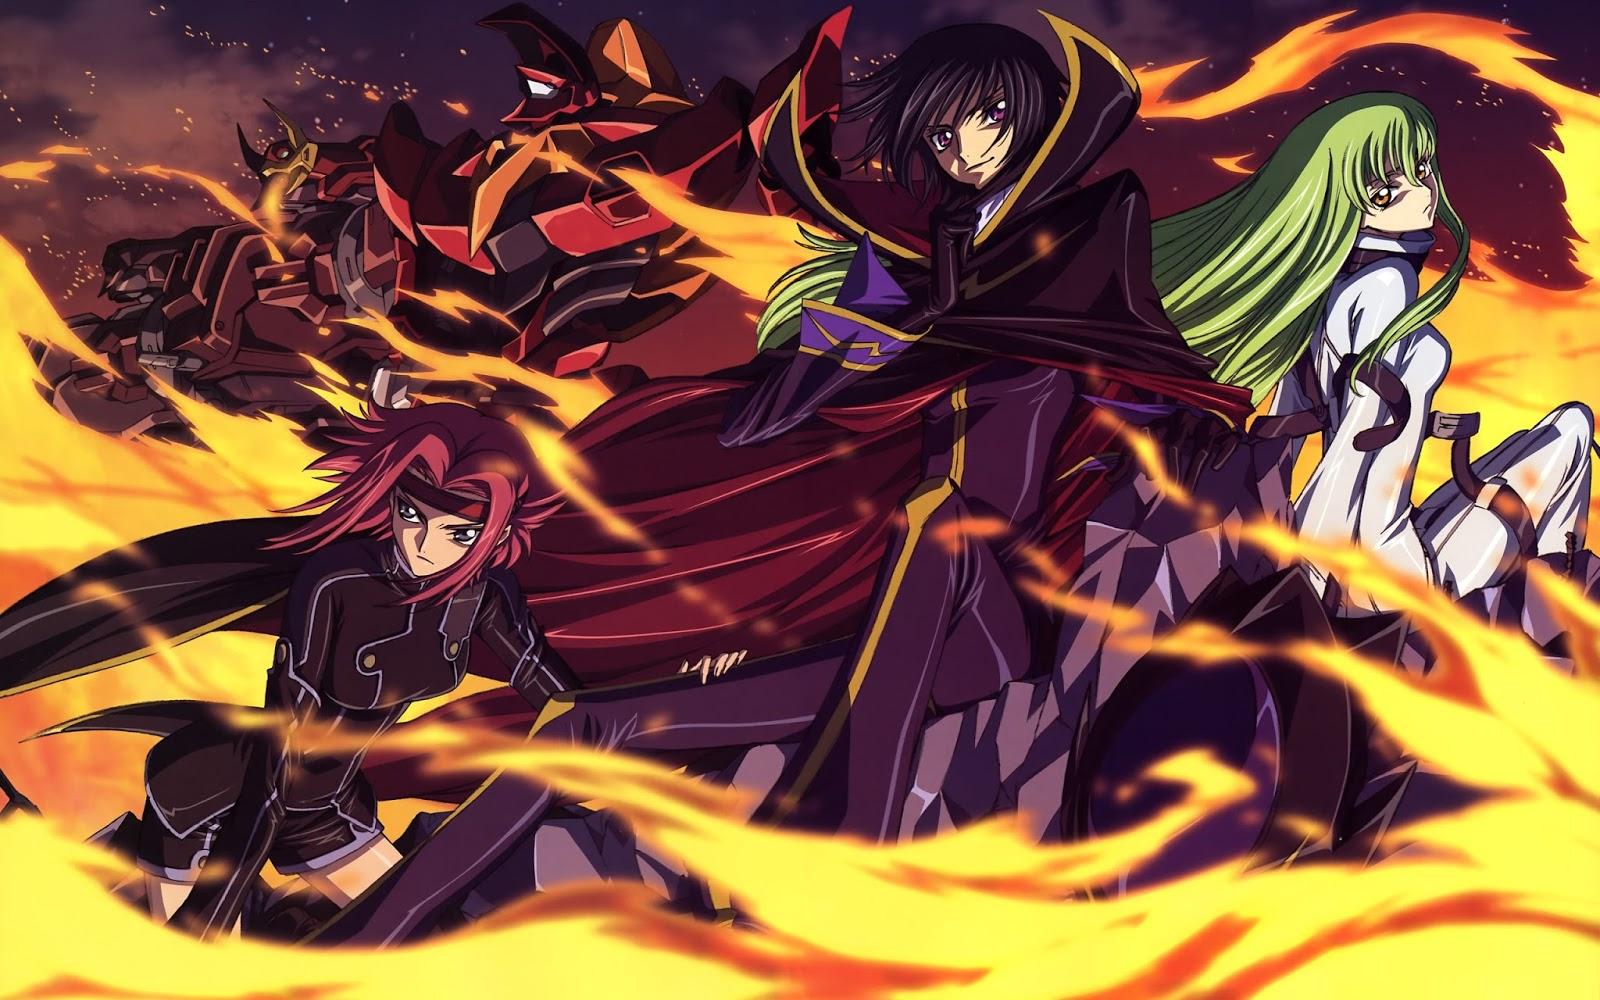 21 Rekomendasi Anime Mecha Terbaik Pilihan AmagiPark